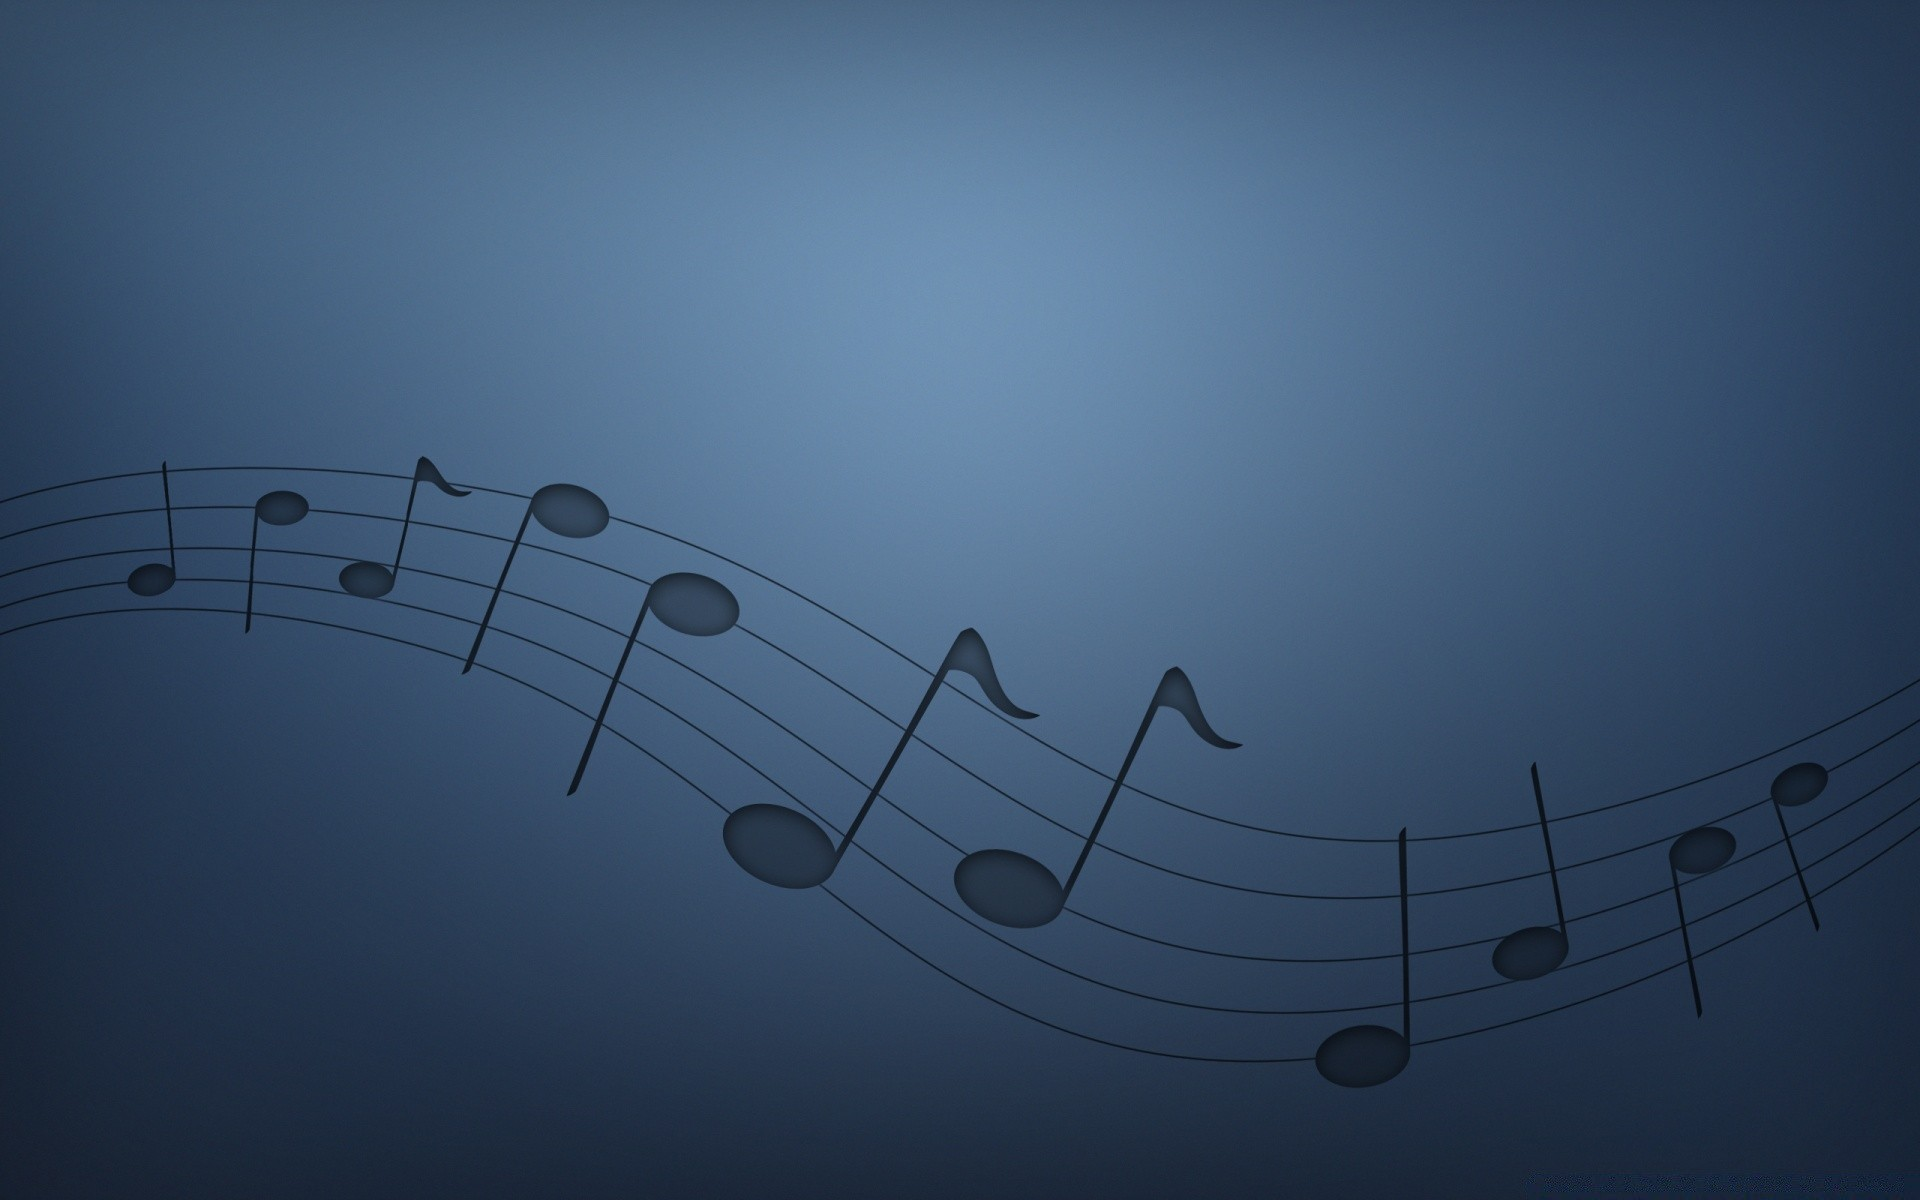 Amazing Wallpaper Music Desktop - 426447267535771  You Should Have_854584.jpg